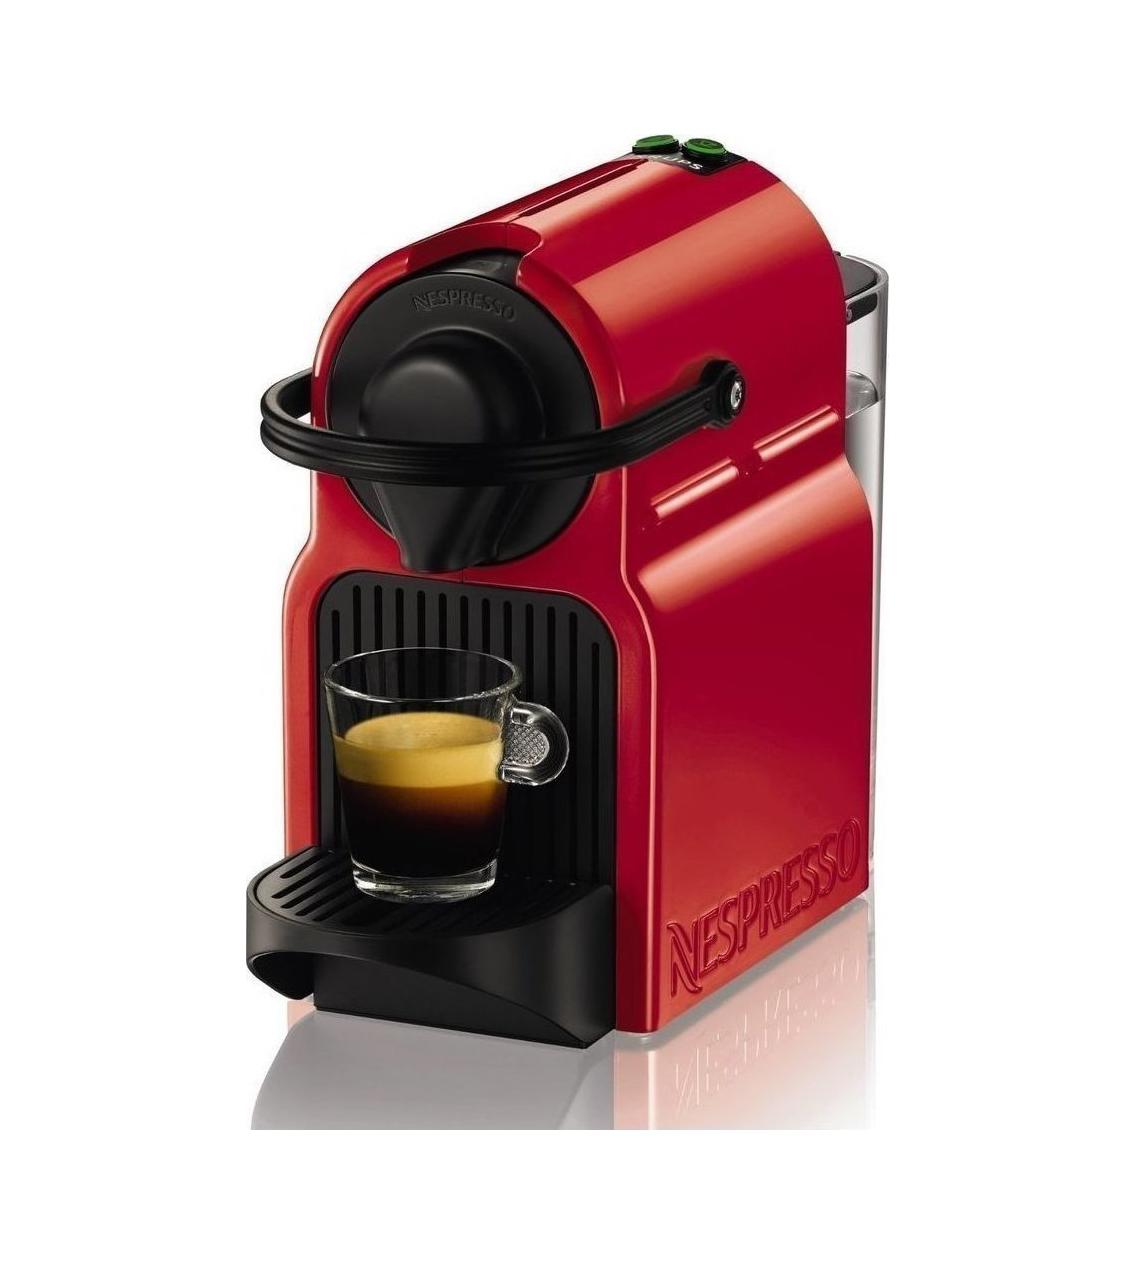 Krups Nespresso Inissia XN1005 Μηχανή Espresso Red